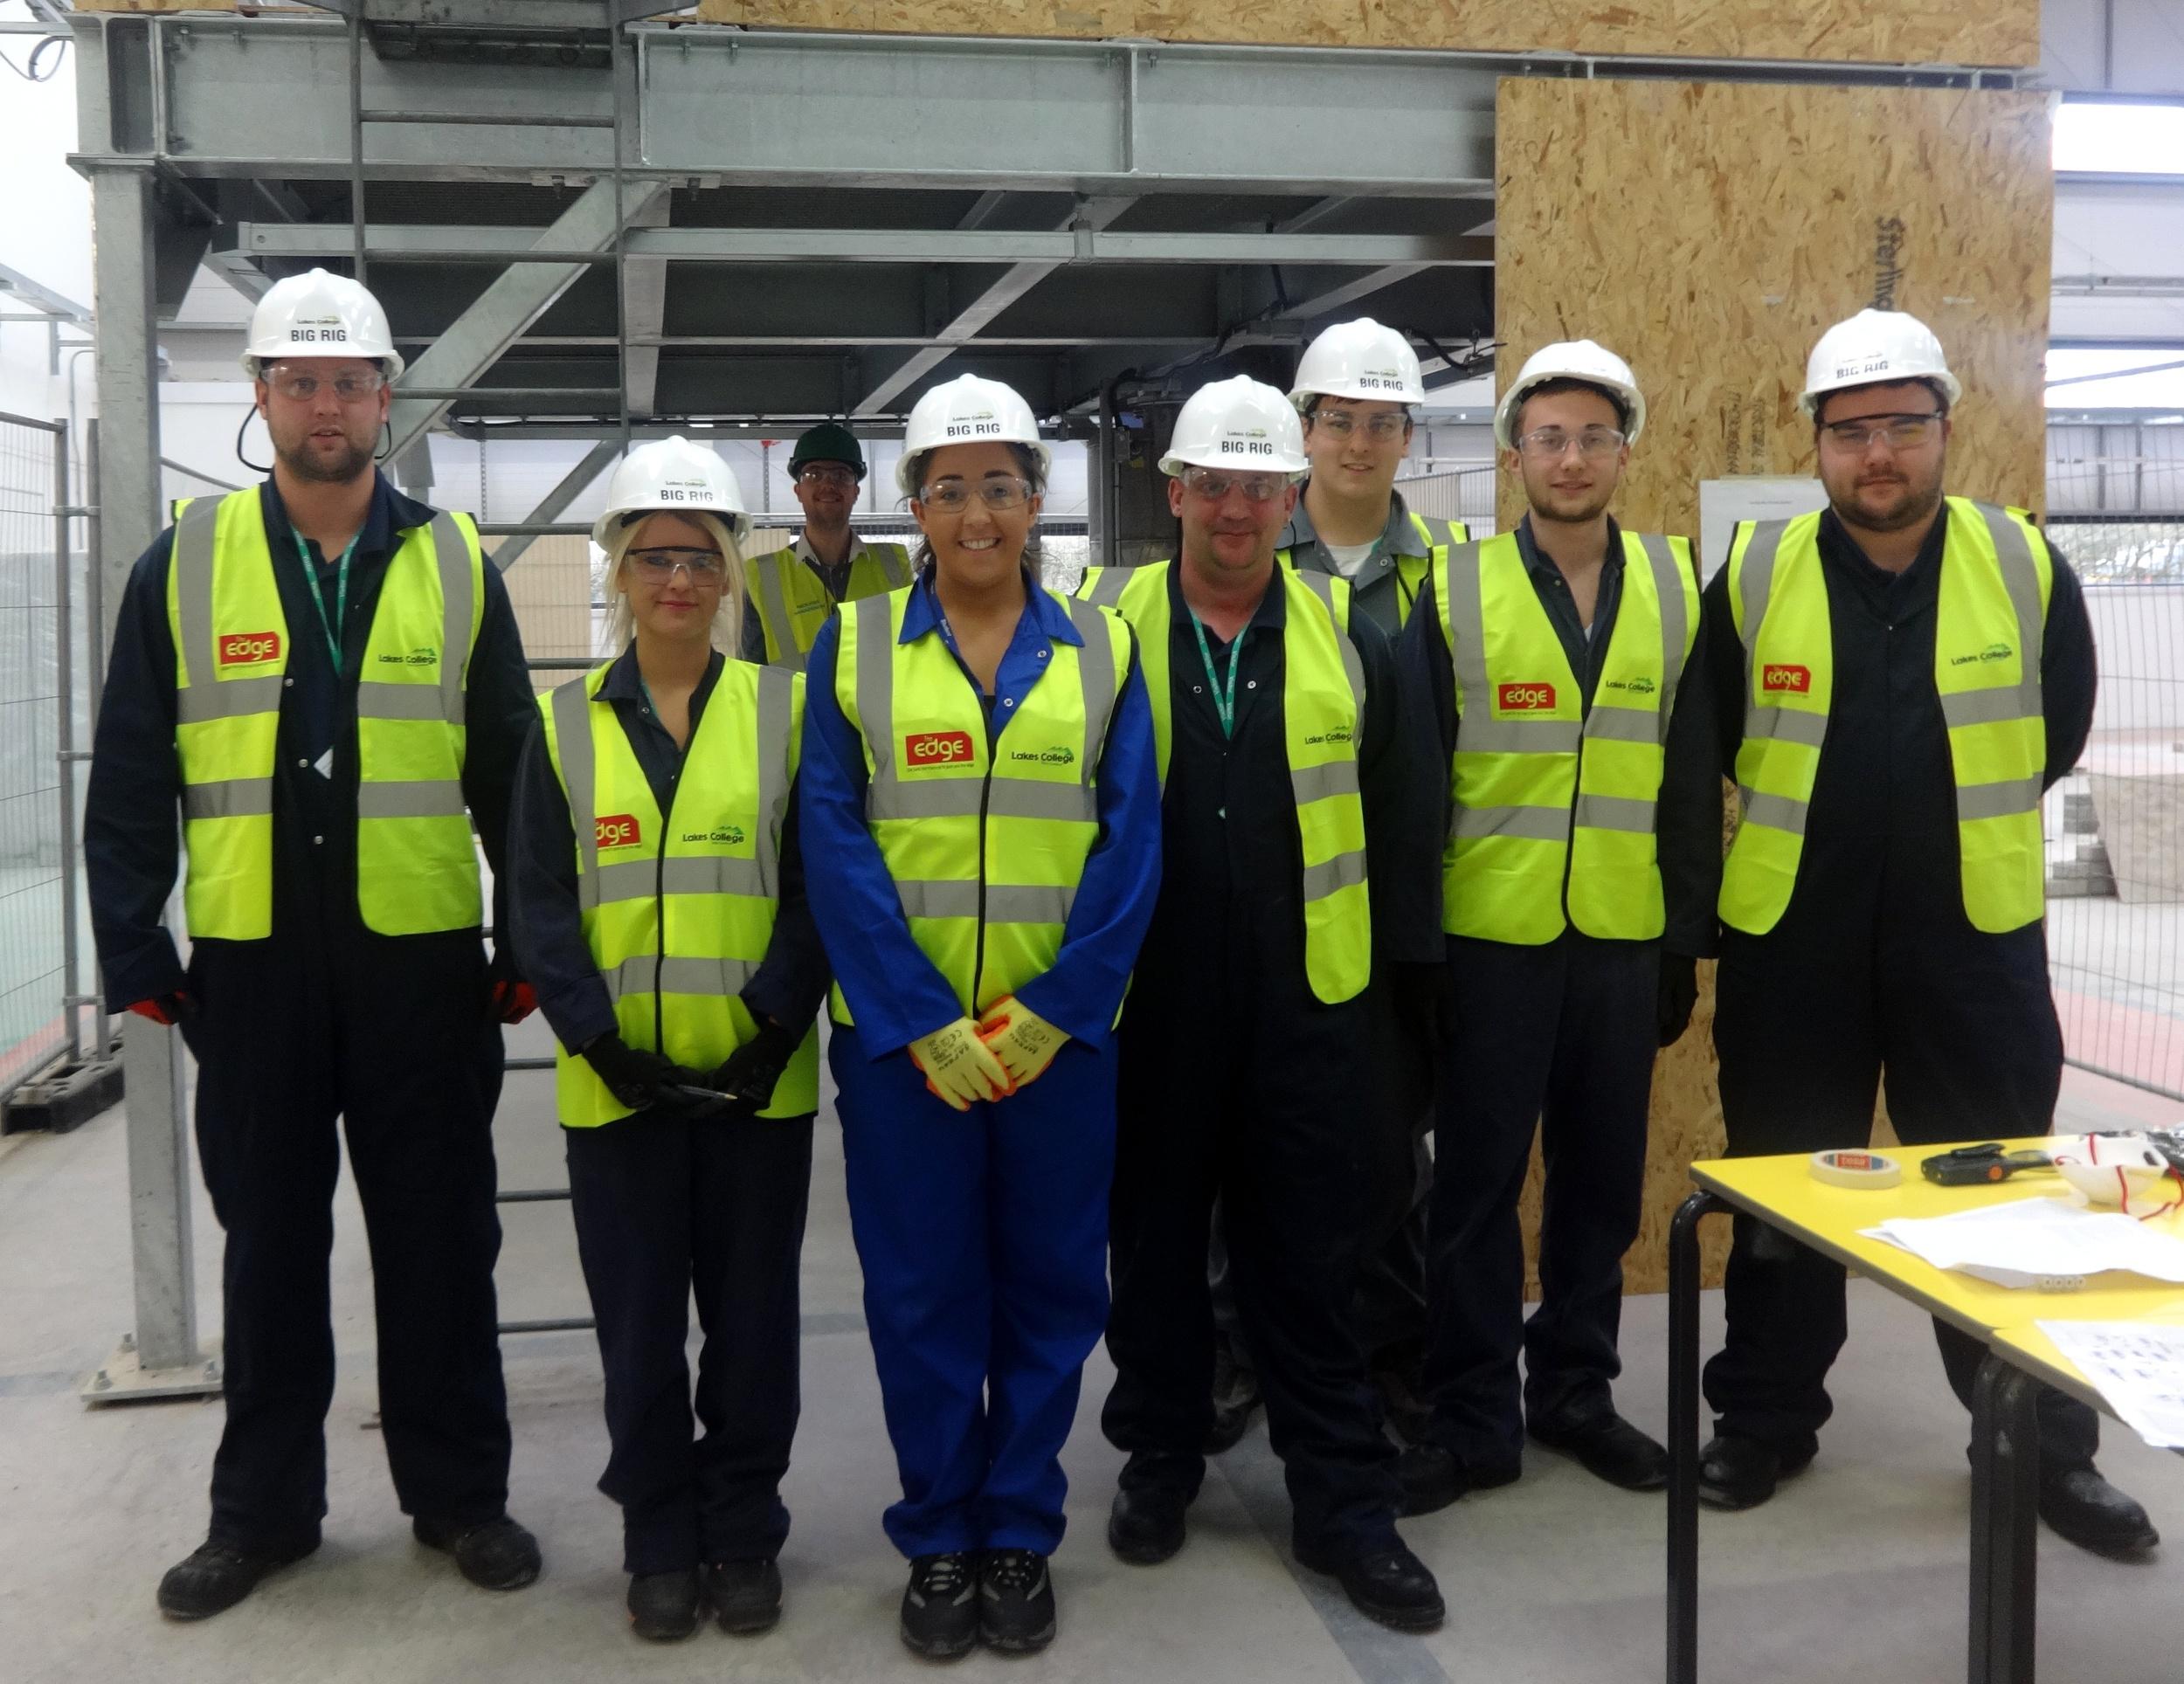 apprentice laura parker (3rd from left)